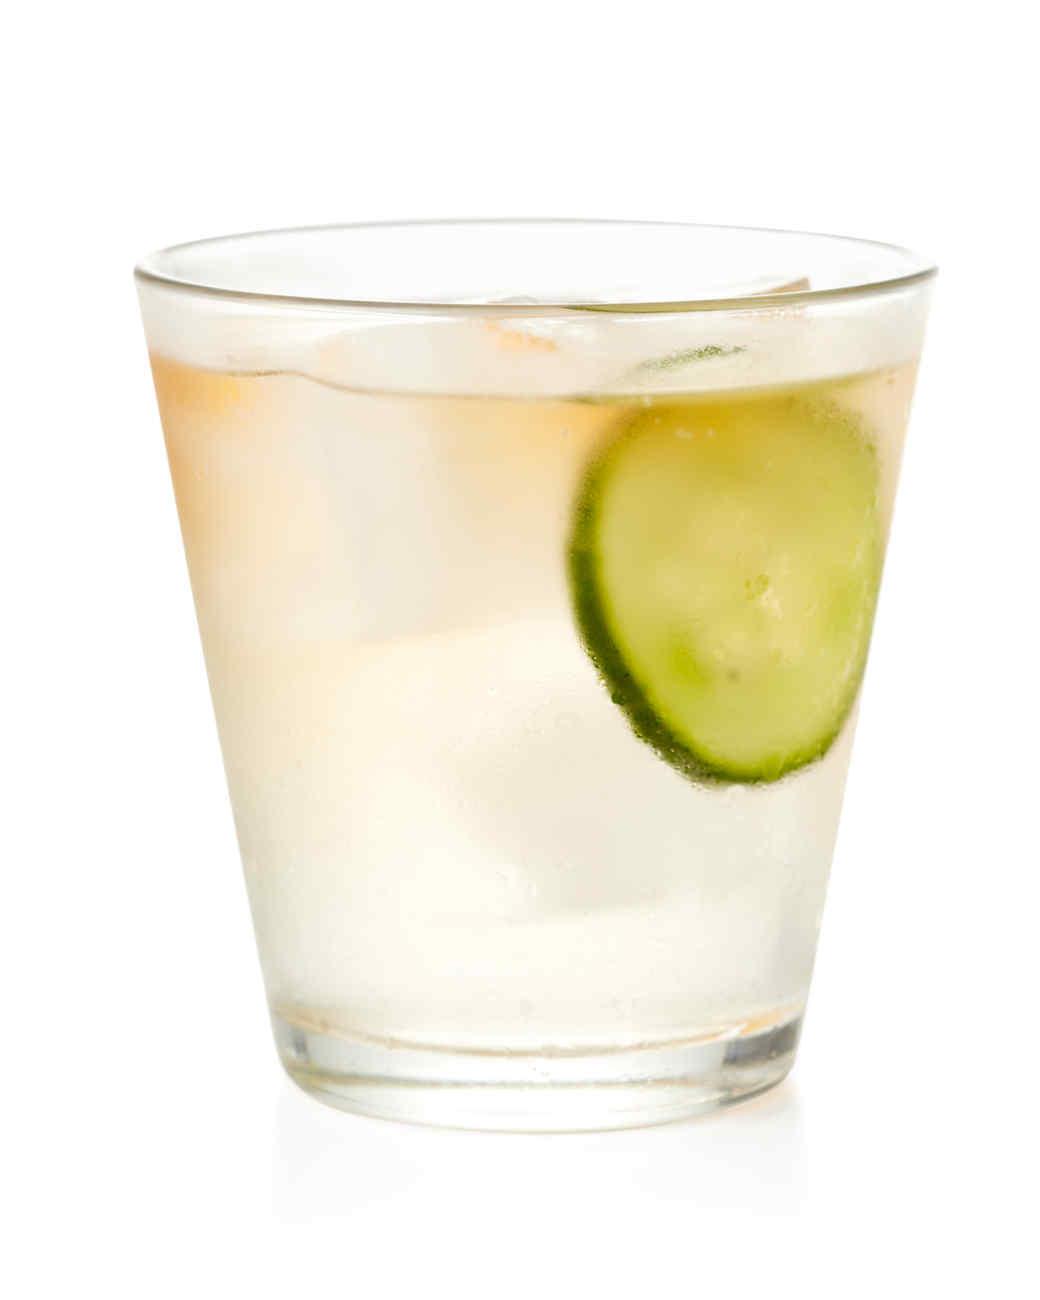 cucumber-drink-ed108679.jpg